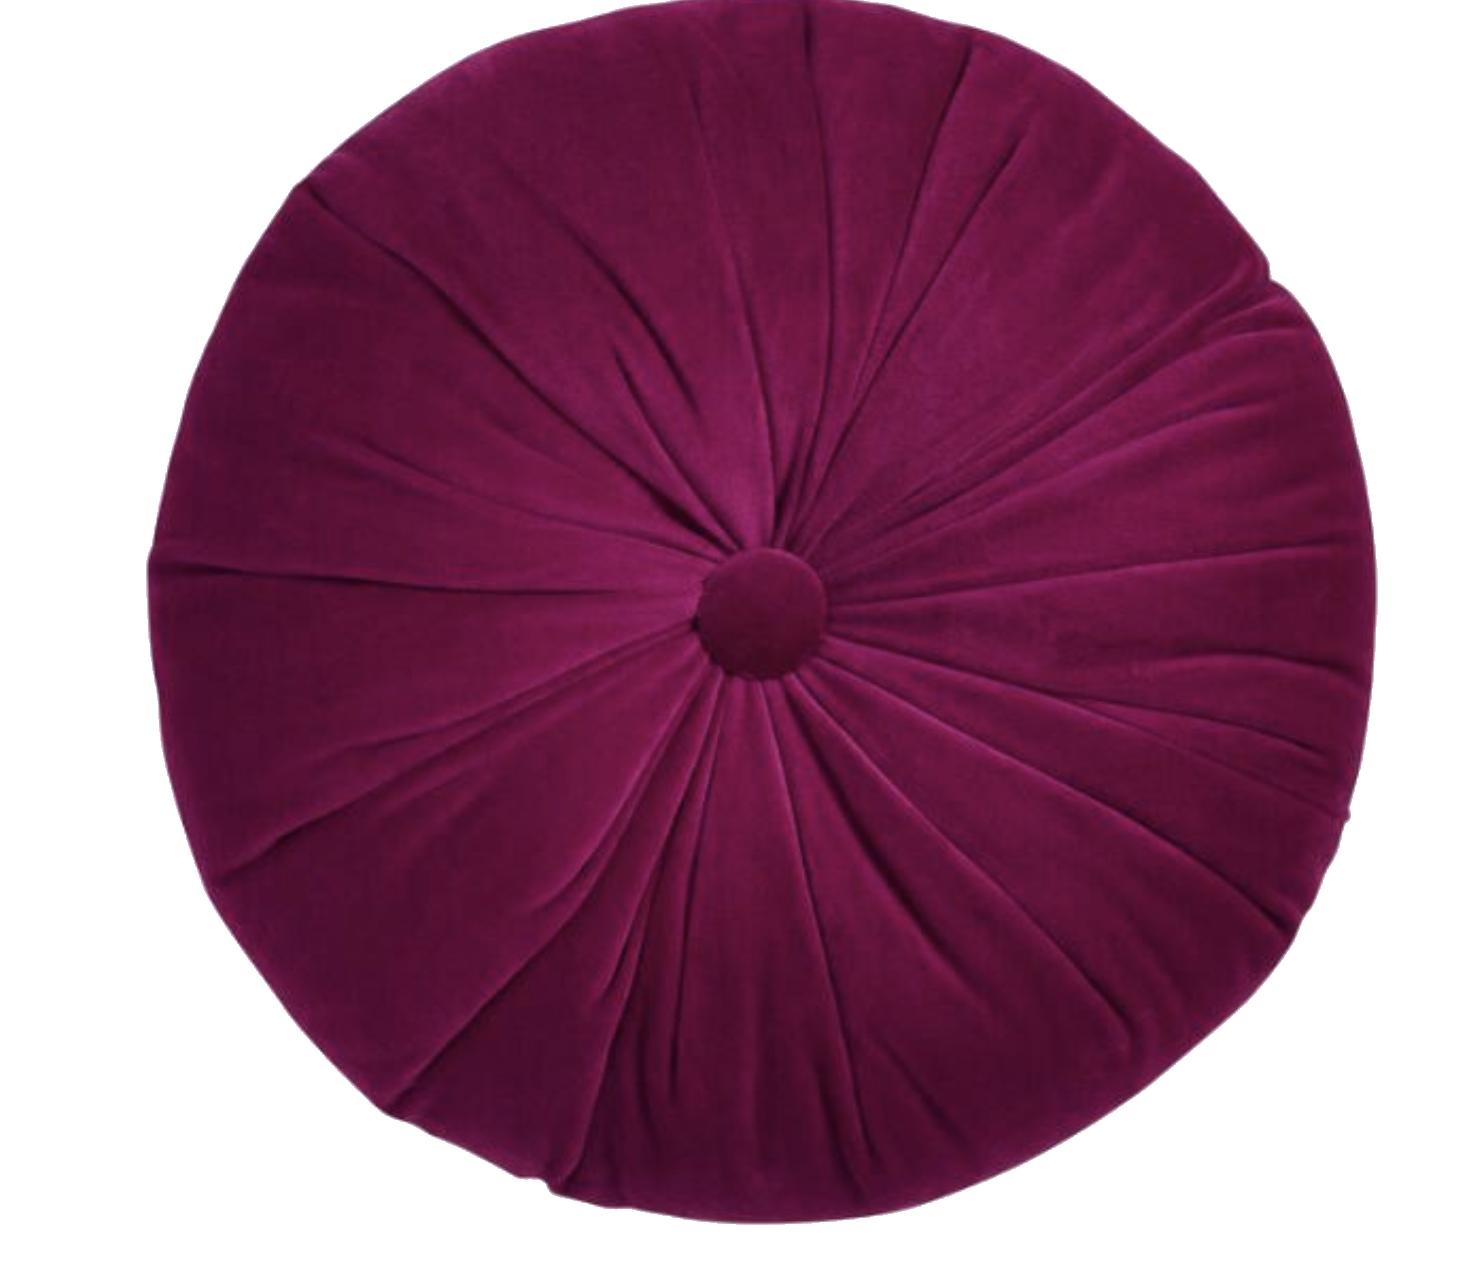 Fuscia Round Pillow.png